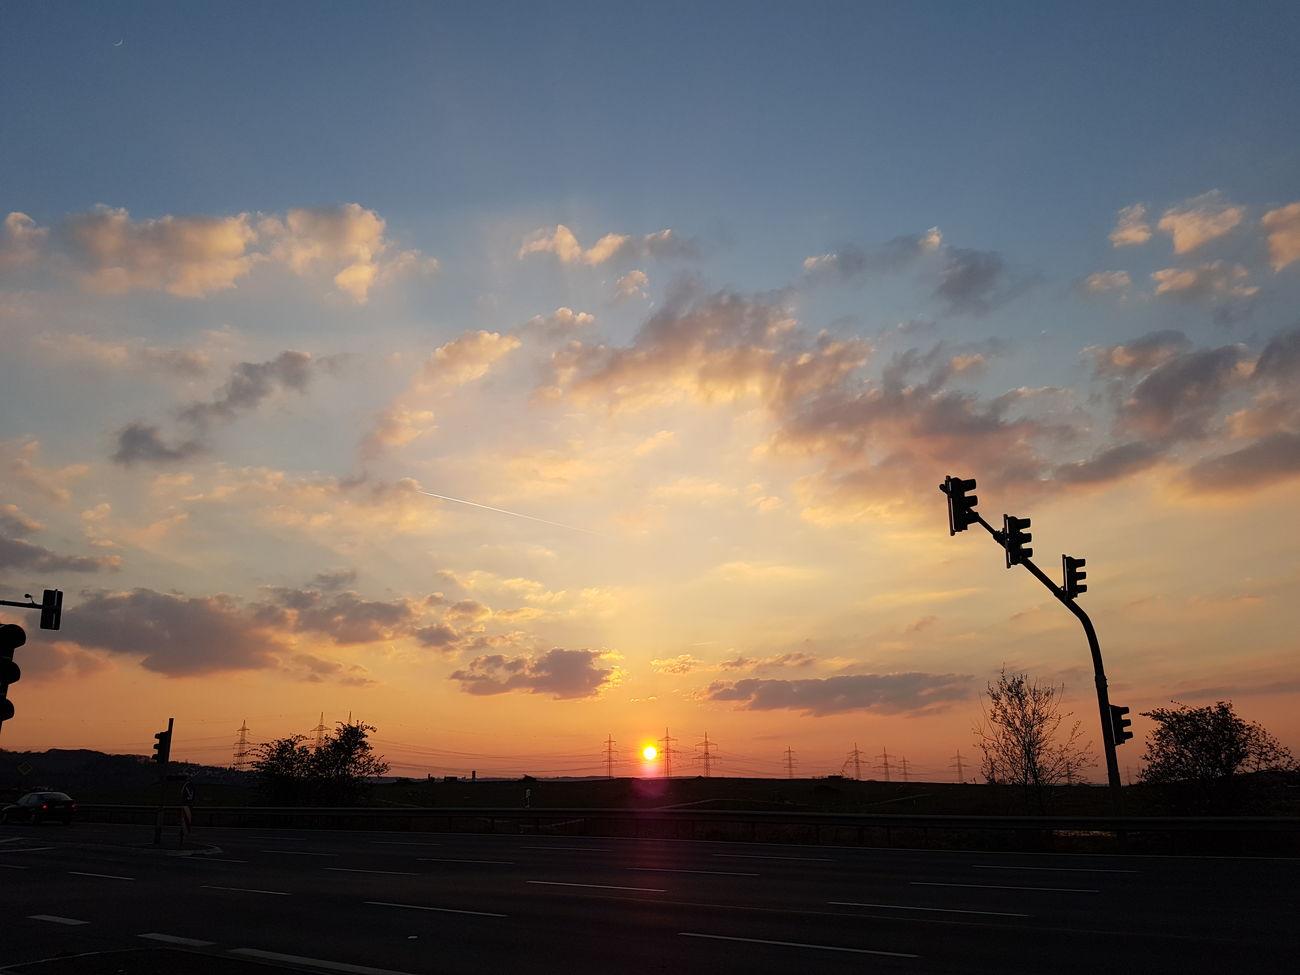 Germany Bornheim S7 Edge Nofilter Sunset